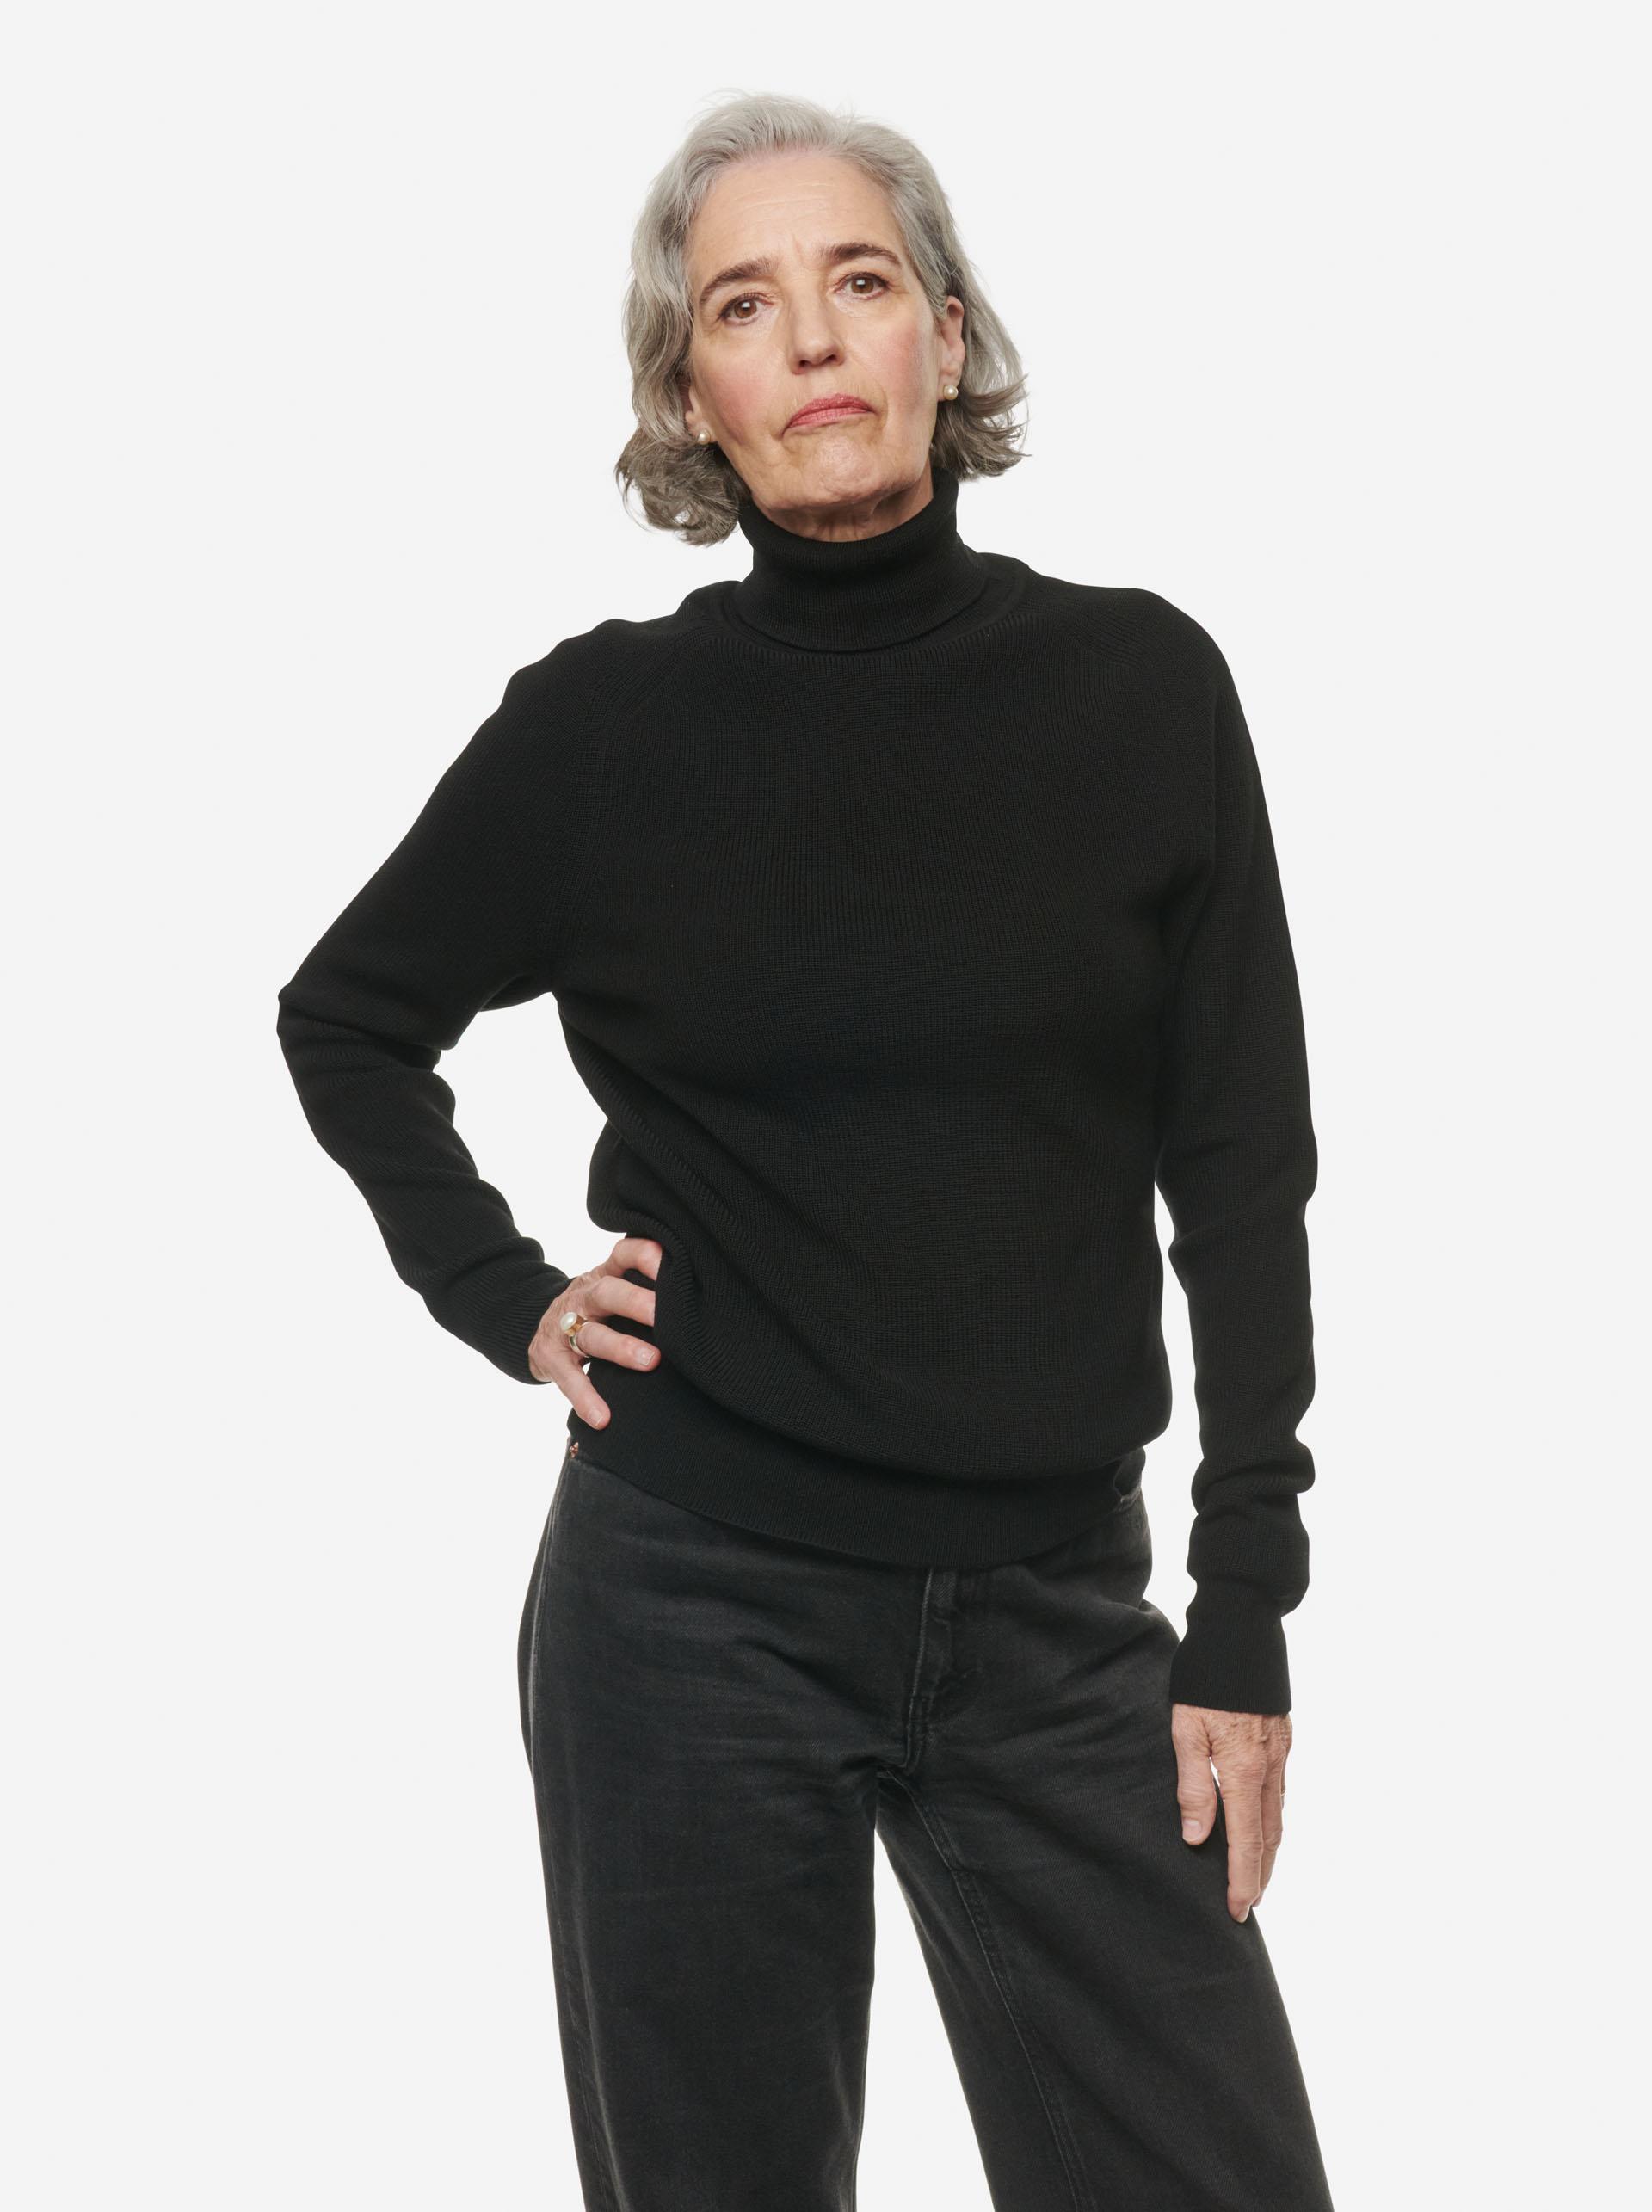 Teym - Turtleneck - The Merino Sweater - Women - Black - 5